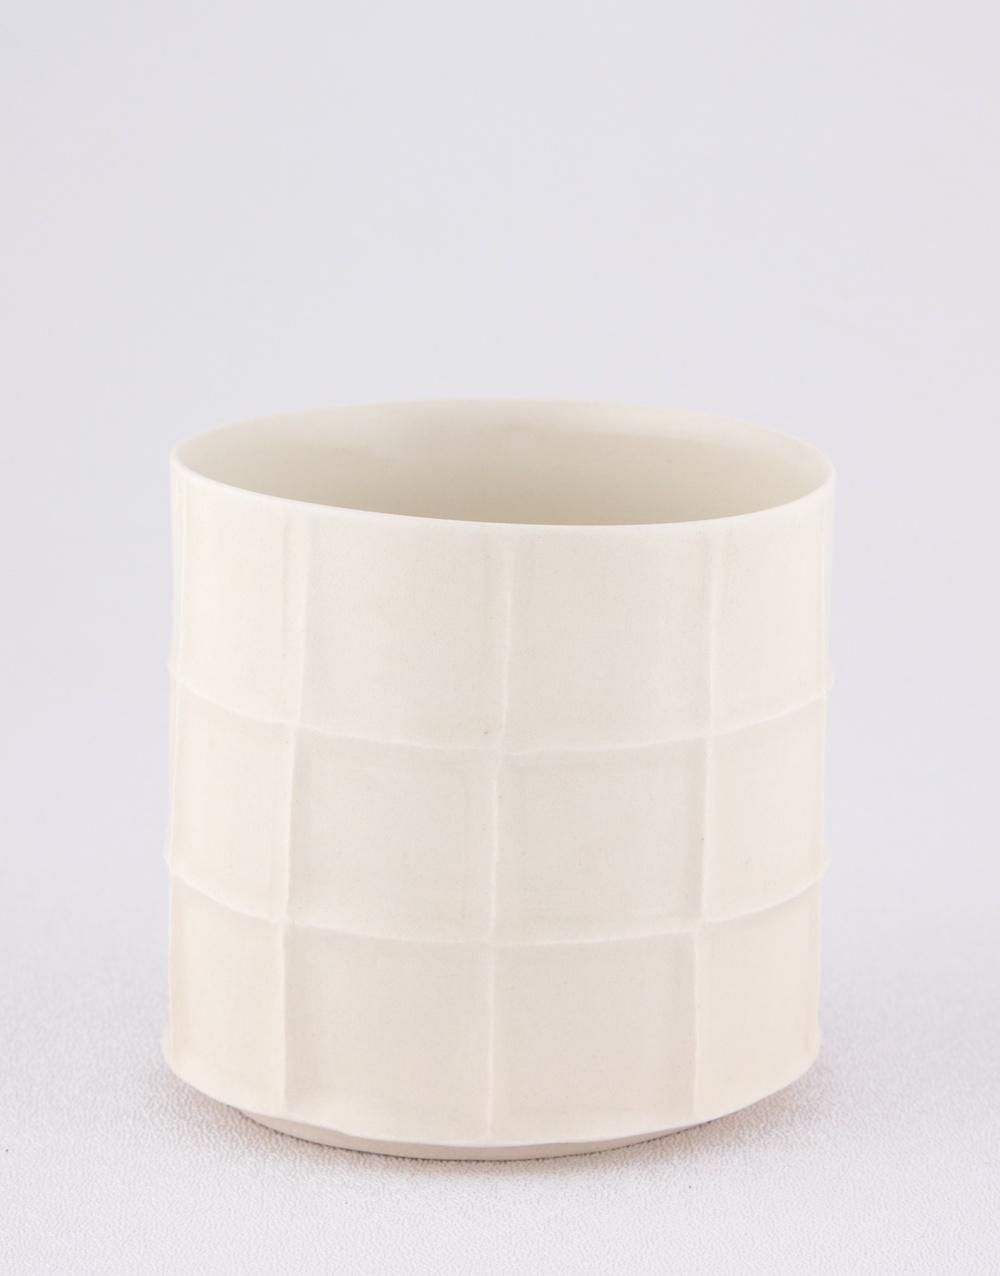 "Shio Kusaka Untitled (cup) 2009 Porcelain 3 1/8"" x 3 1/4"" SK012"